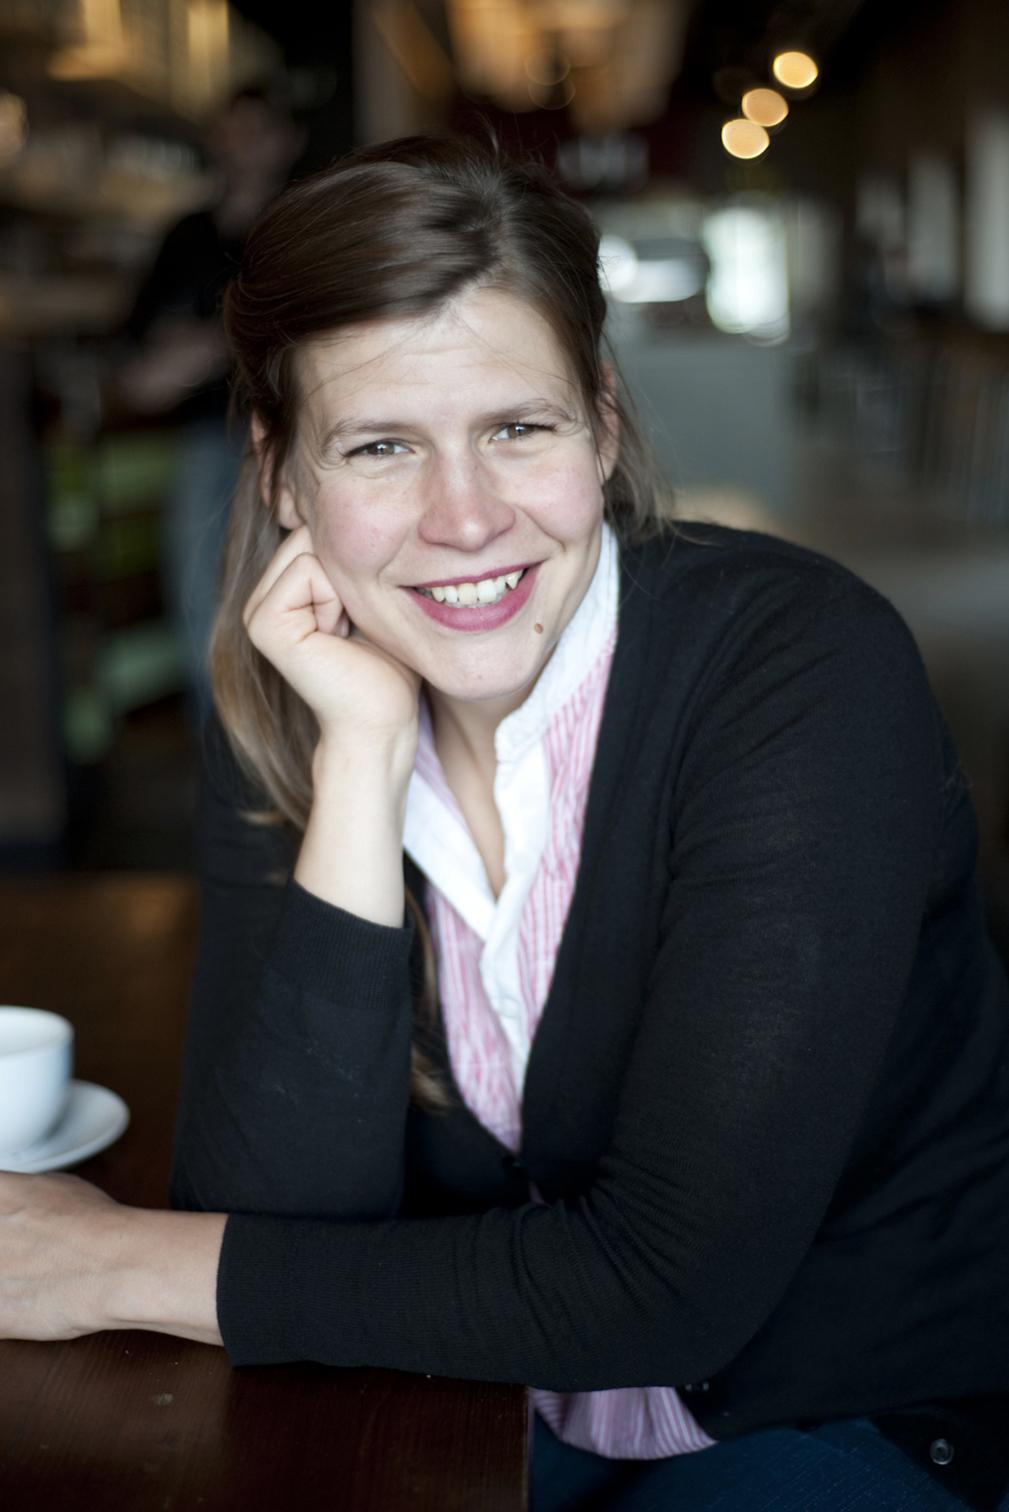 Bettina von Kameke portrait and documentary photographer based in Berlin.